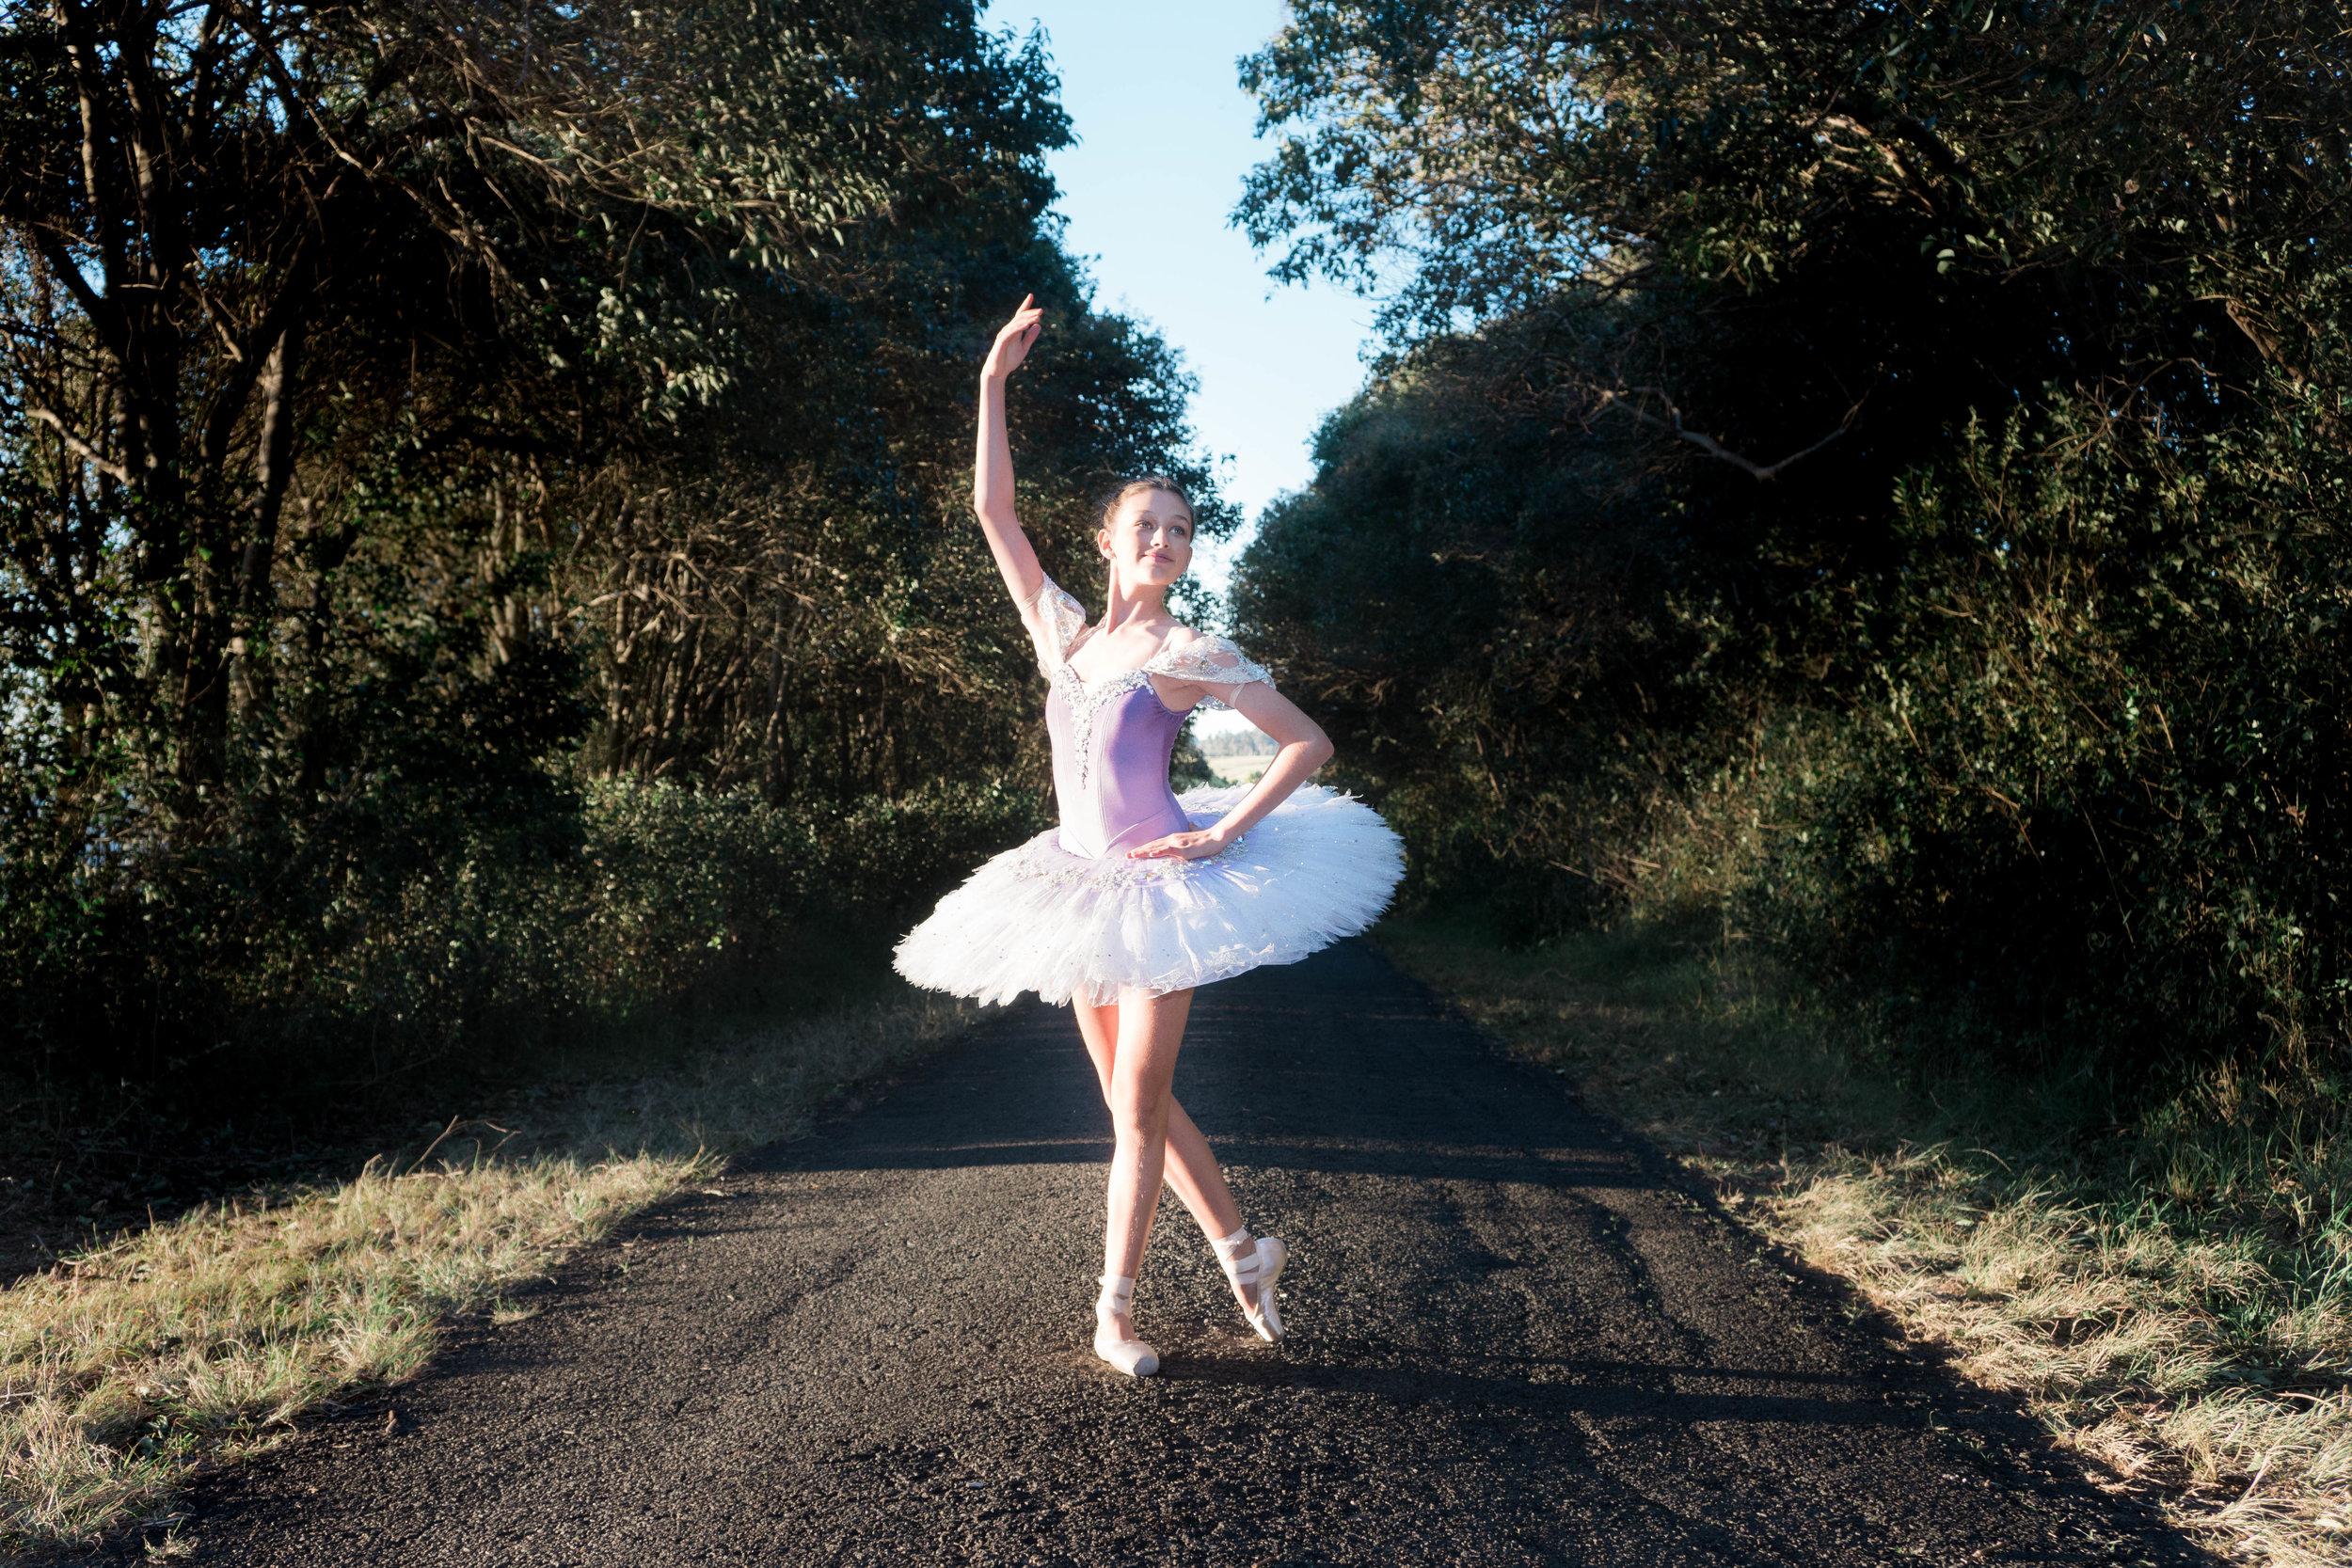 Hinterland-Dance-20.08.17-42.jpg